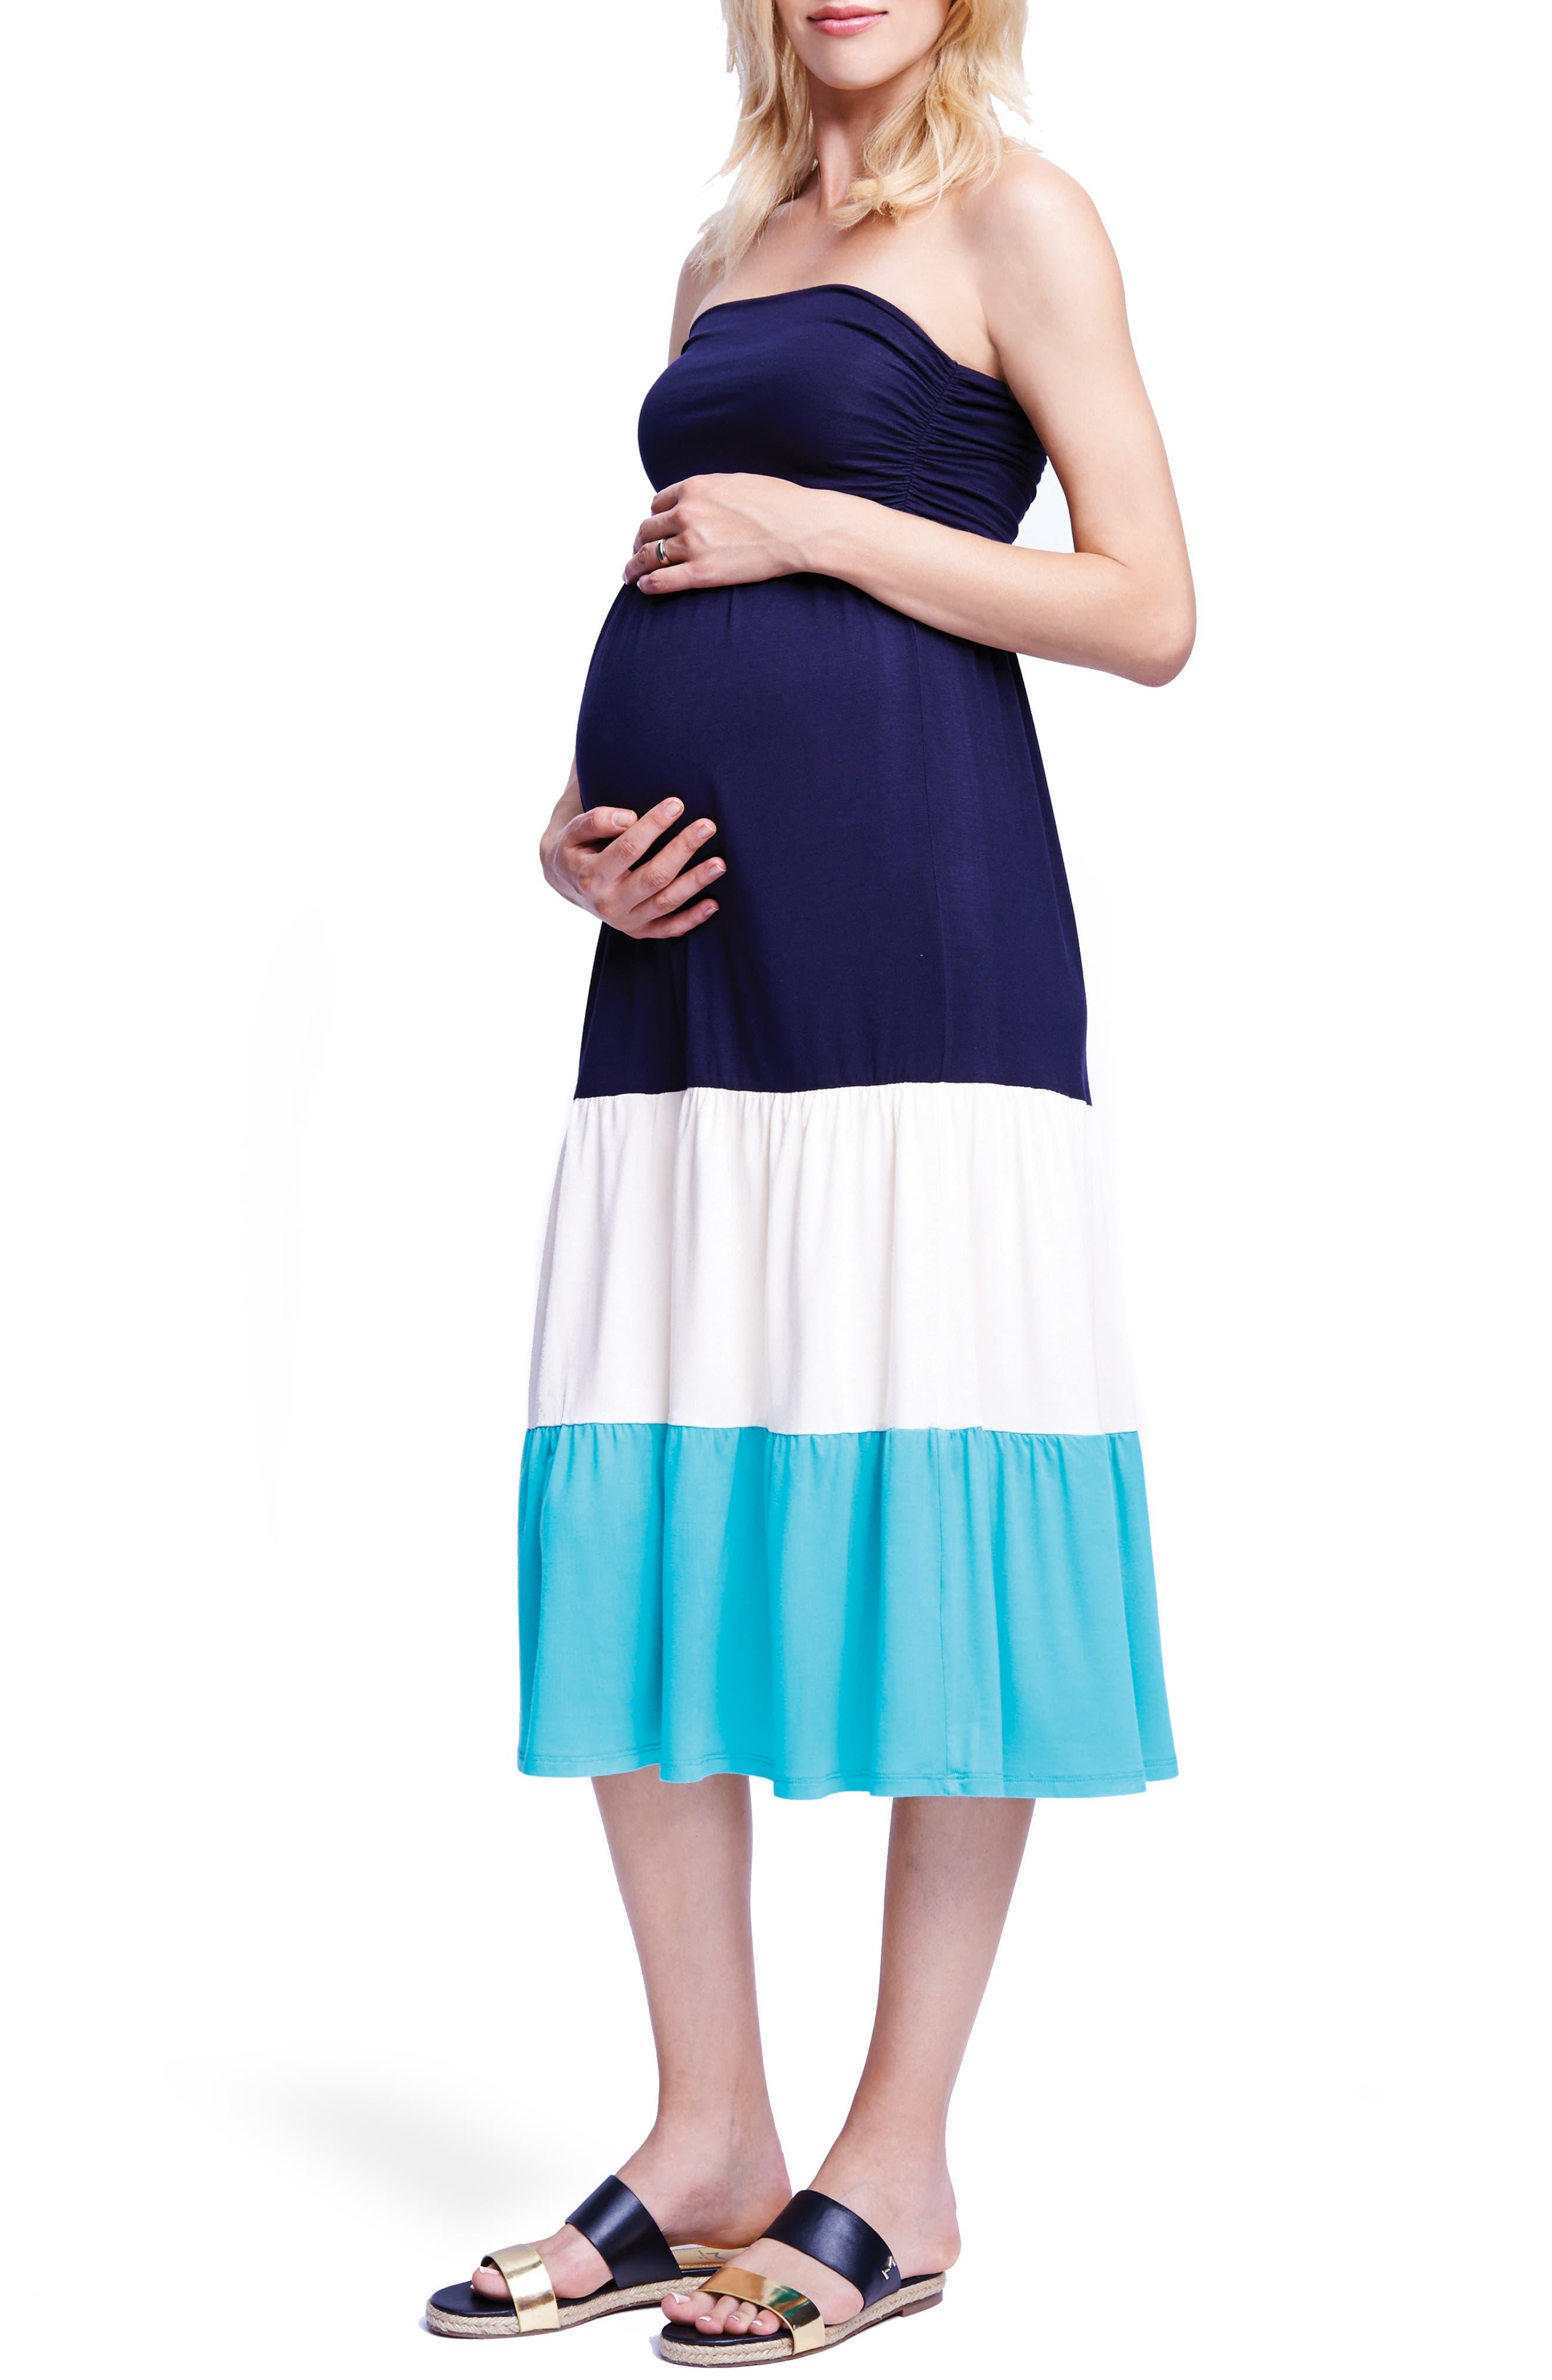 Strapless Maternity Dress